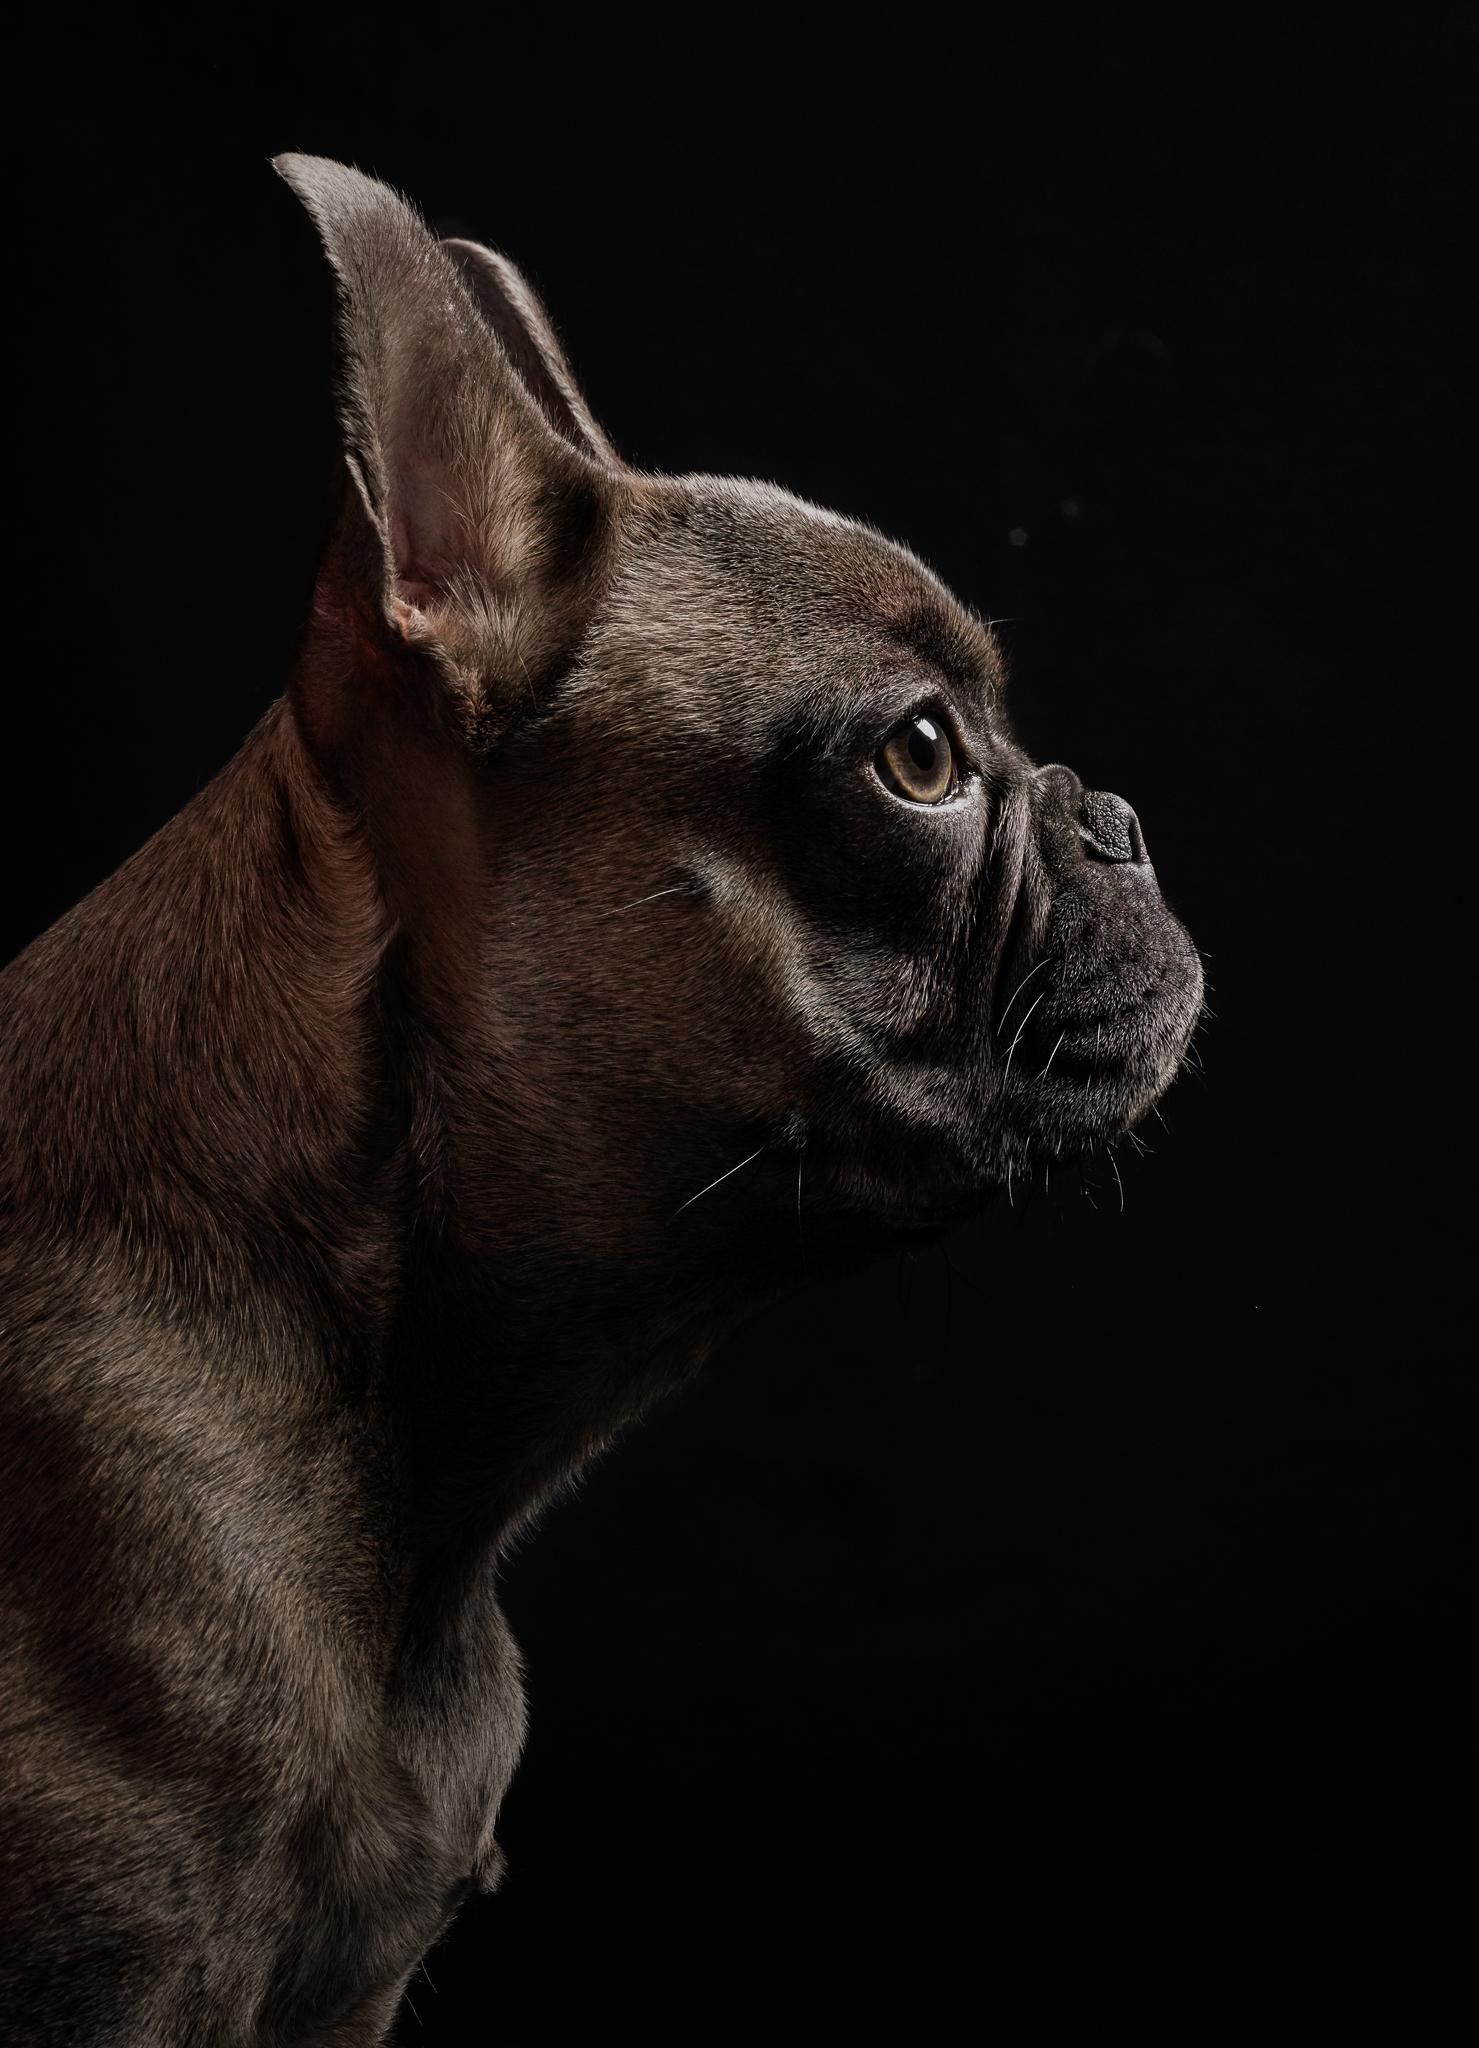 dog-photography-klaus-dyba-7.jpg